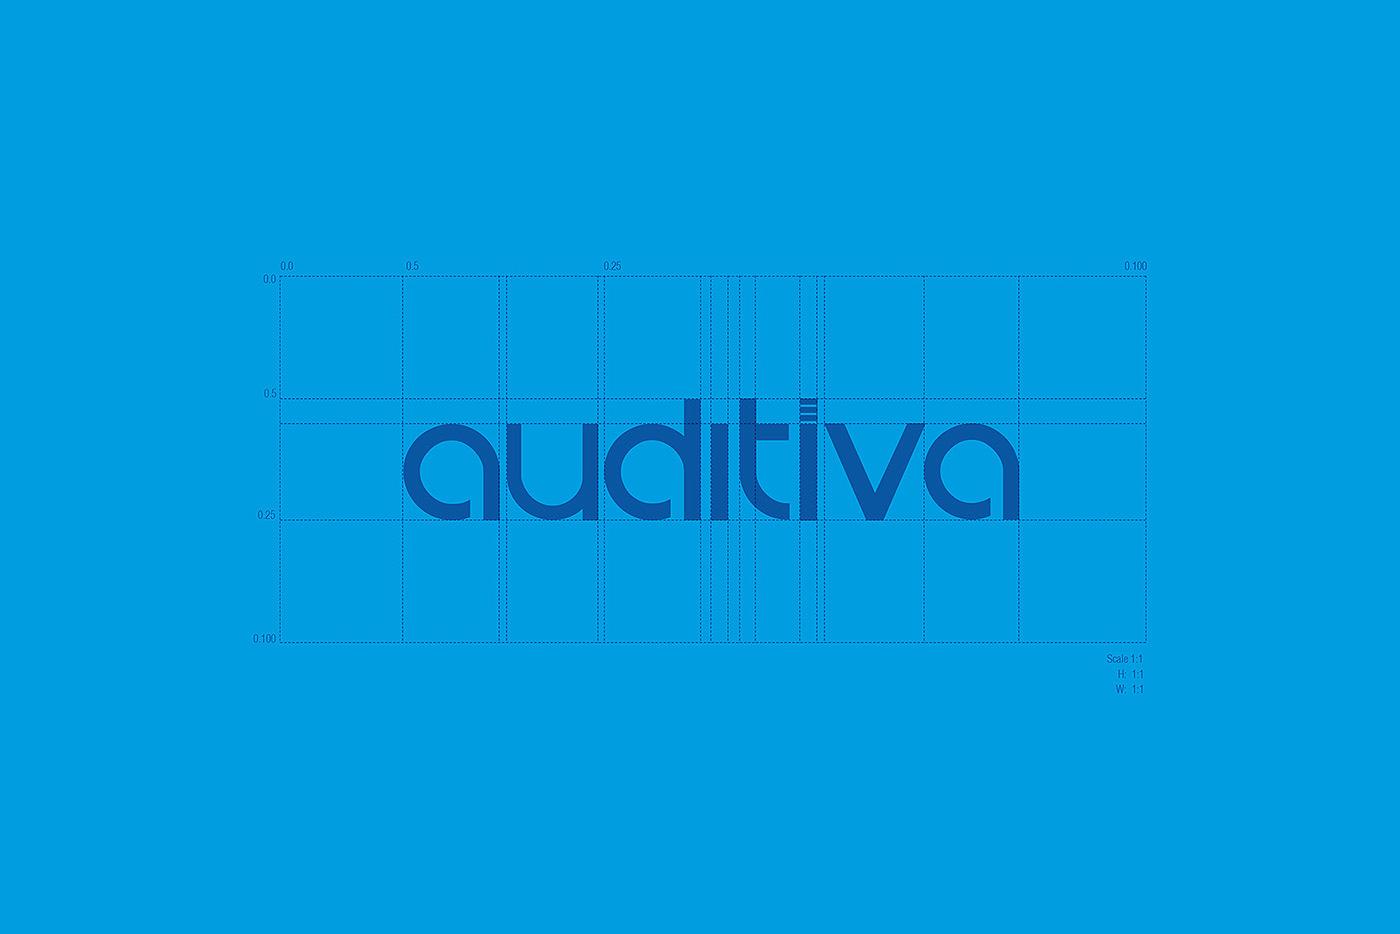 auditiva david espinosa colombia Sonido blue logo Web Icon identity identidad